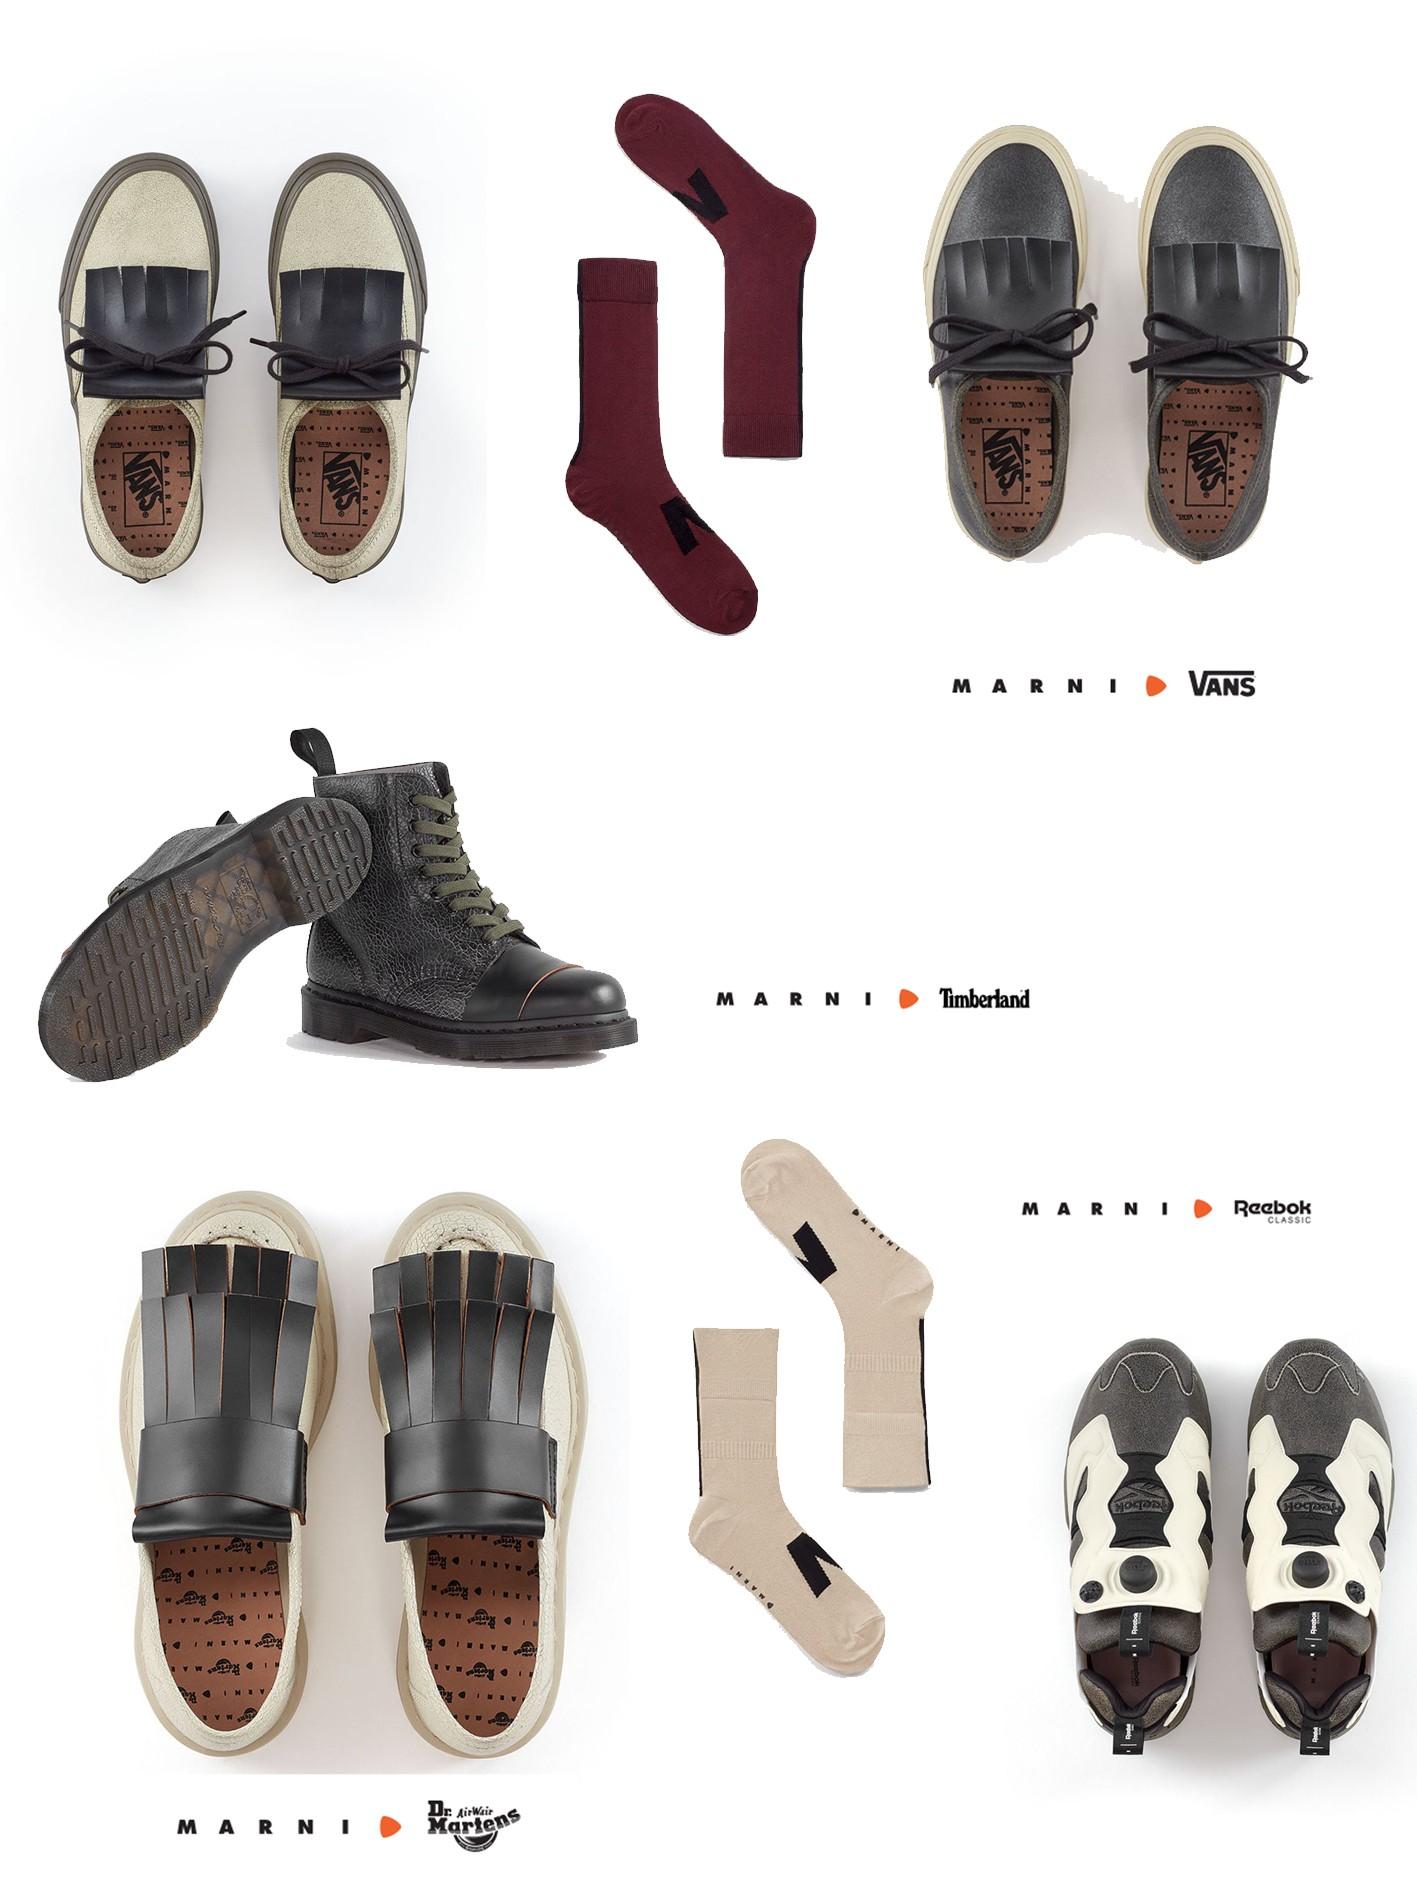 Zalando Mode Dorisknowsfashion Collab La Blog X Marni zFftzxqY